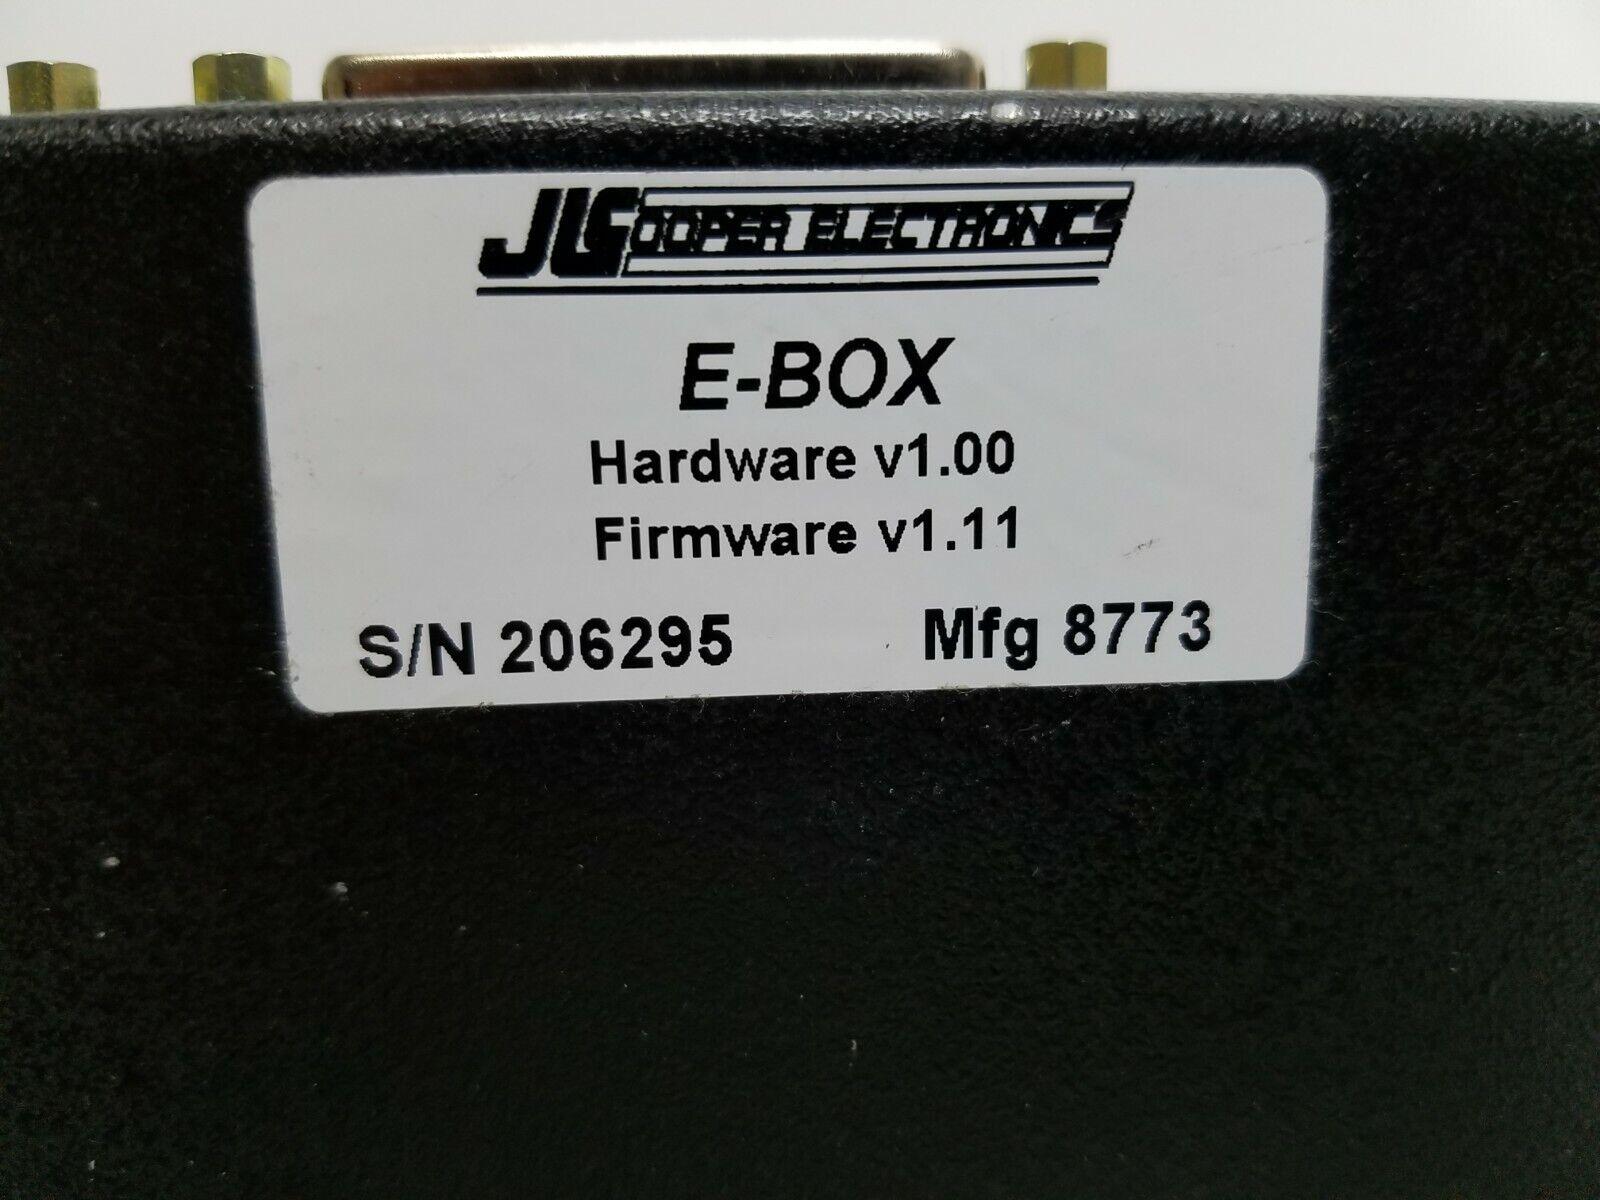 Jlcooper Jlcooper Jlcooper E-Caja portal de interfaz Ethernet para productos Jl Cooper 7b92b9